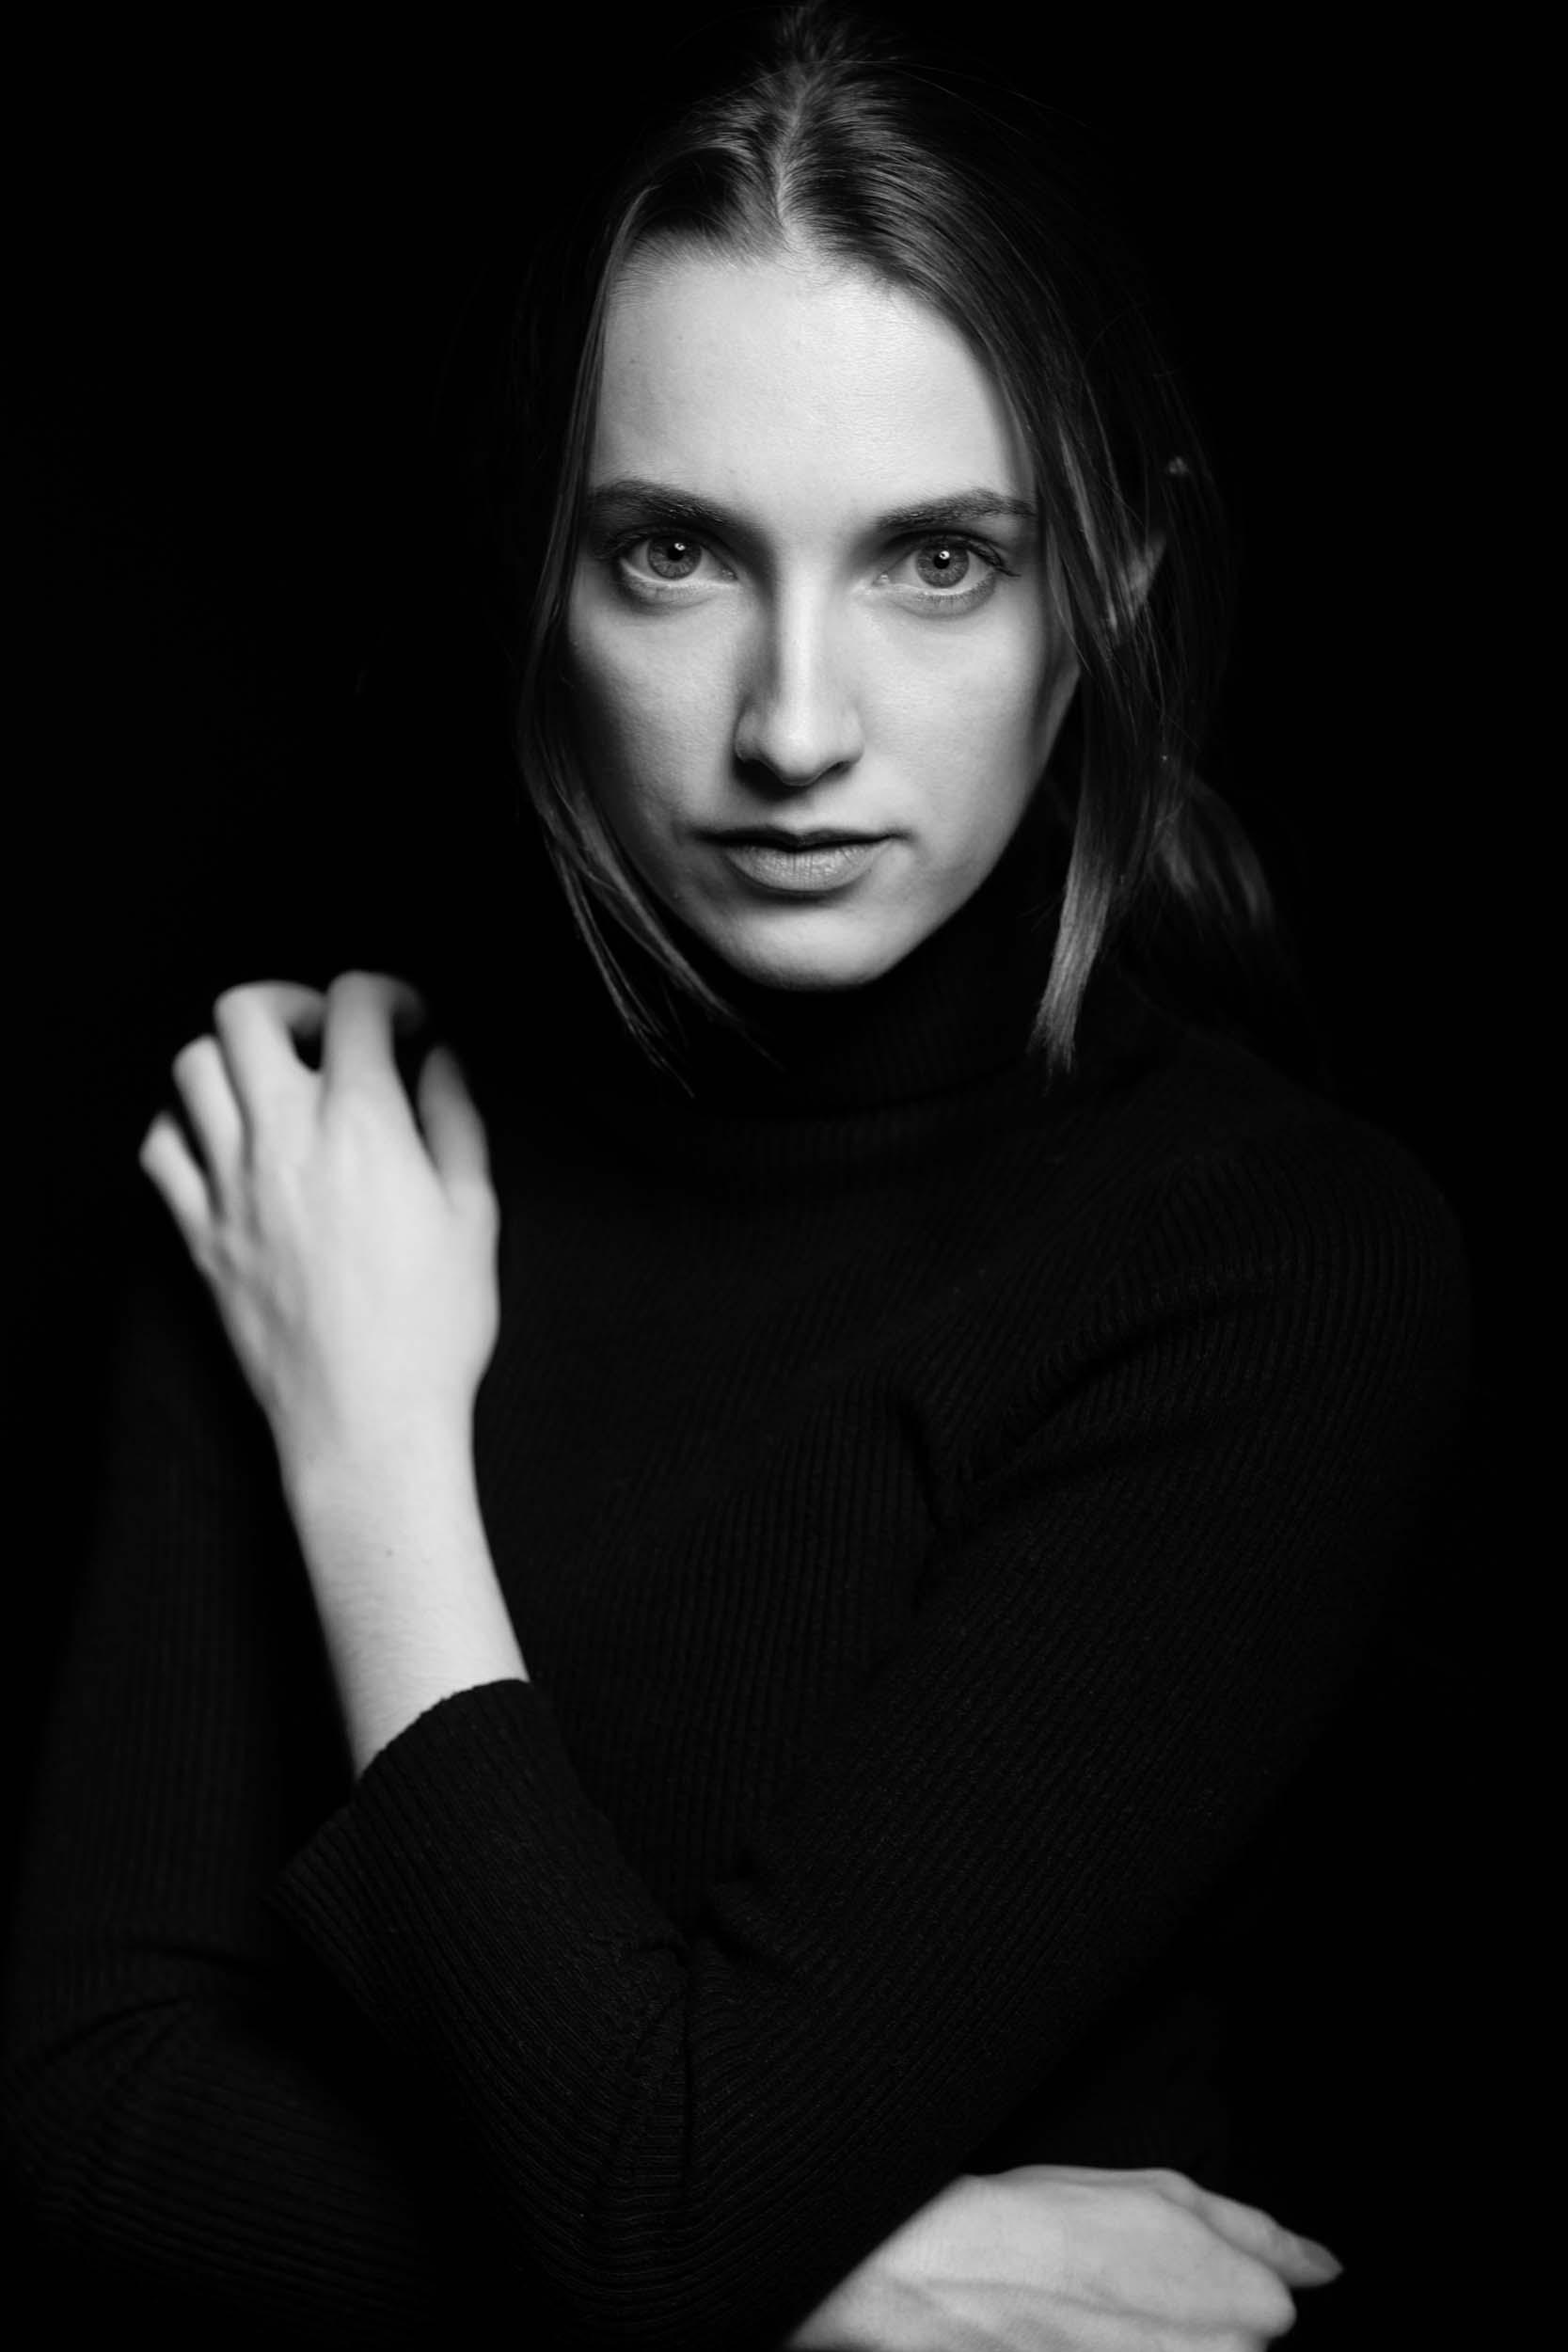 portraitfotografie fotograf filmemacher frankfurt patrick schmetzer portrait black white 1